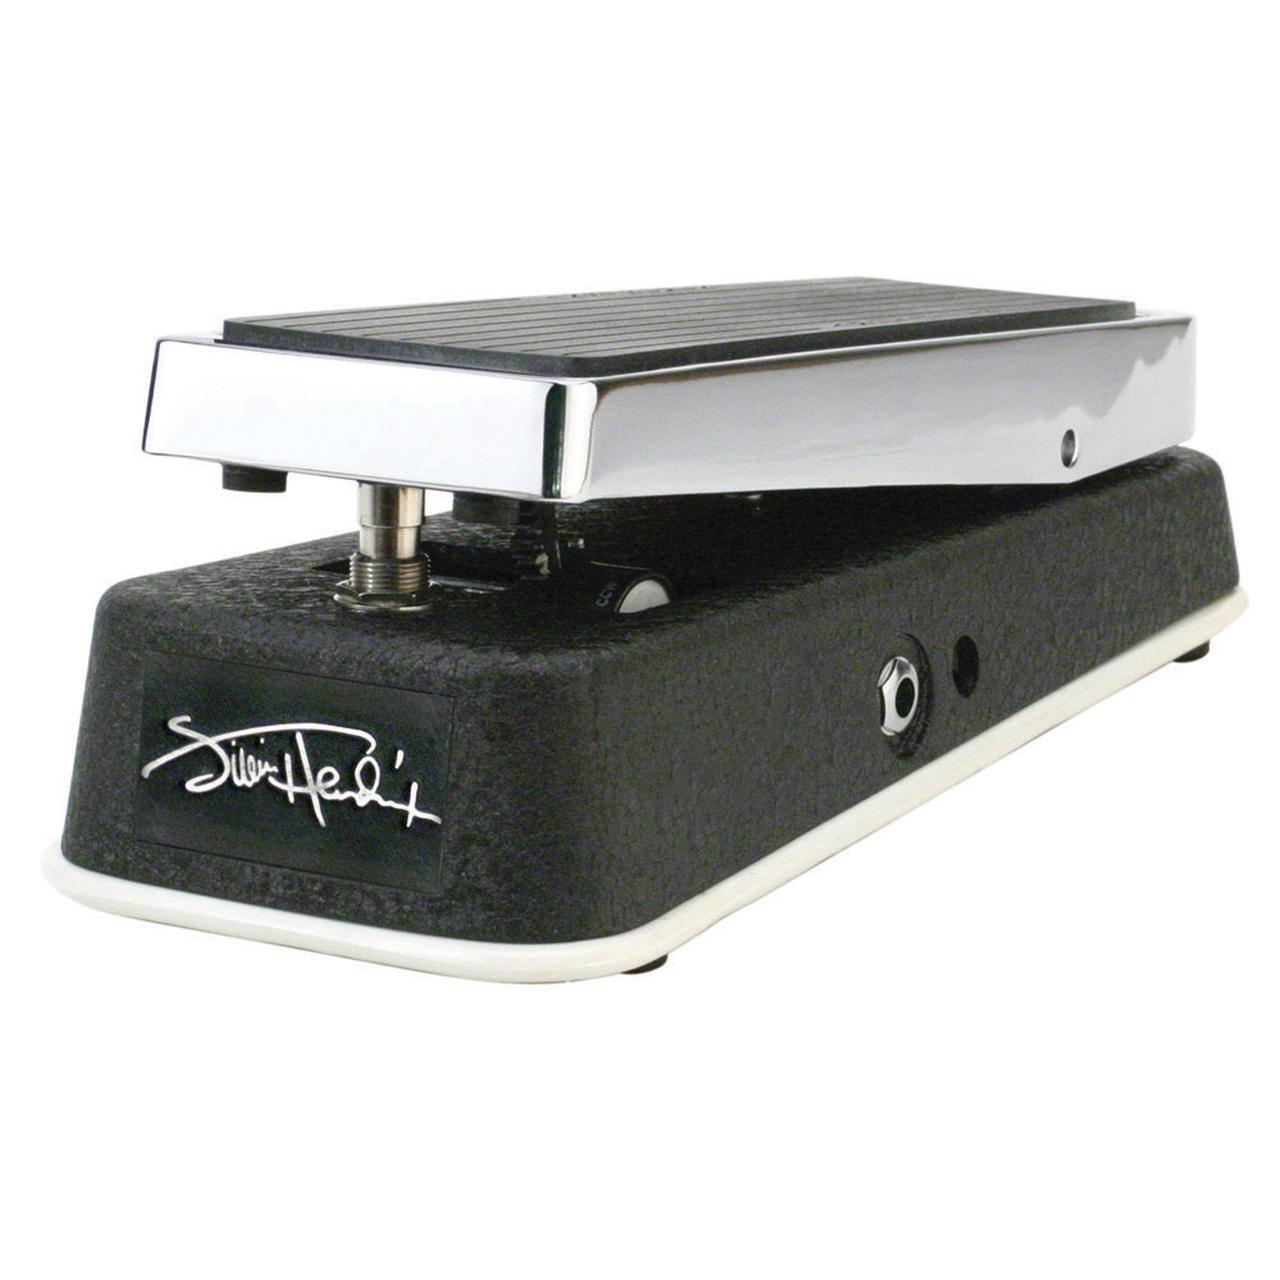 Jimi Hendrix Signature Wah Pedal